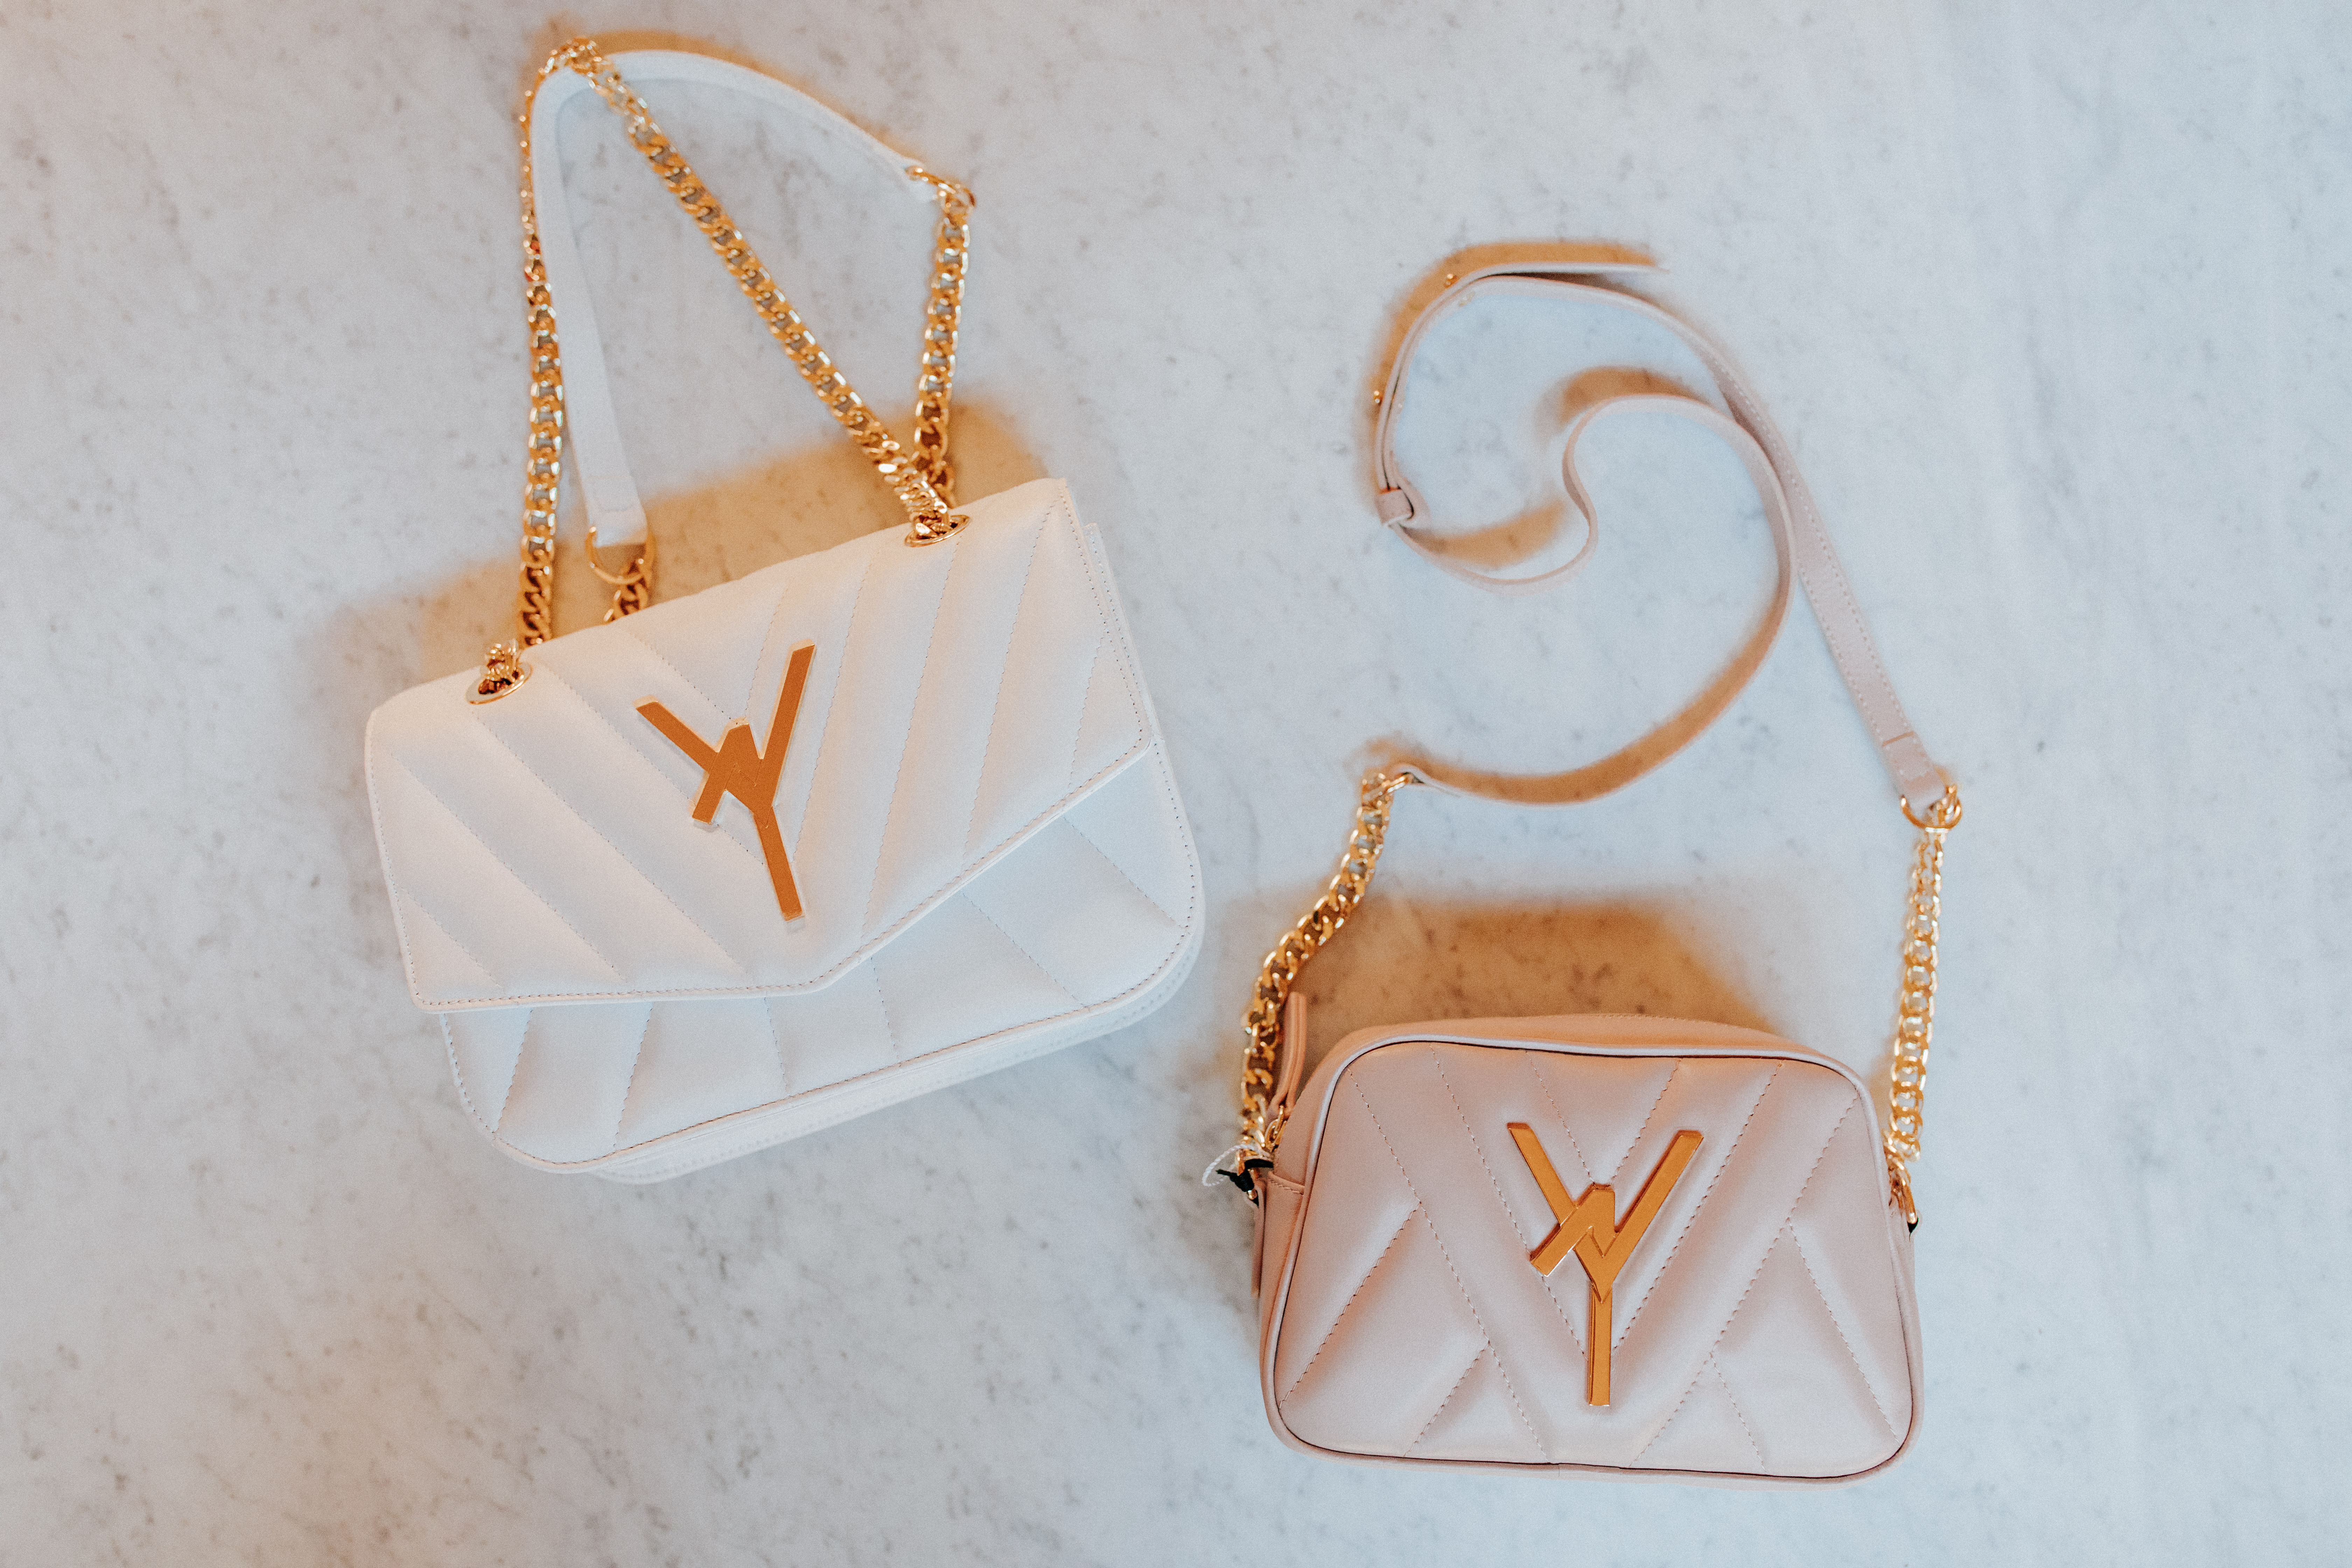 ModeSens 意大利奢侈品牌Atelier V1,Forzieri全球独家在线发售 时尚搭配美女帅哥明星